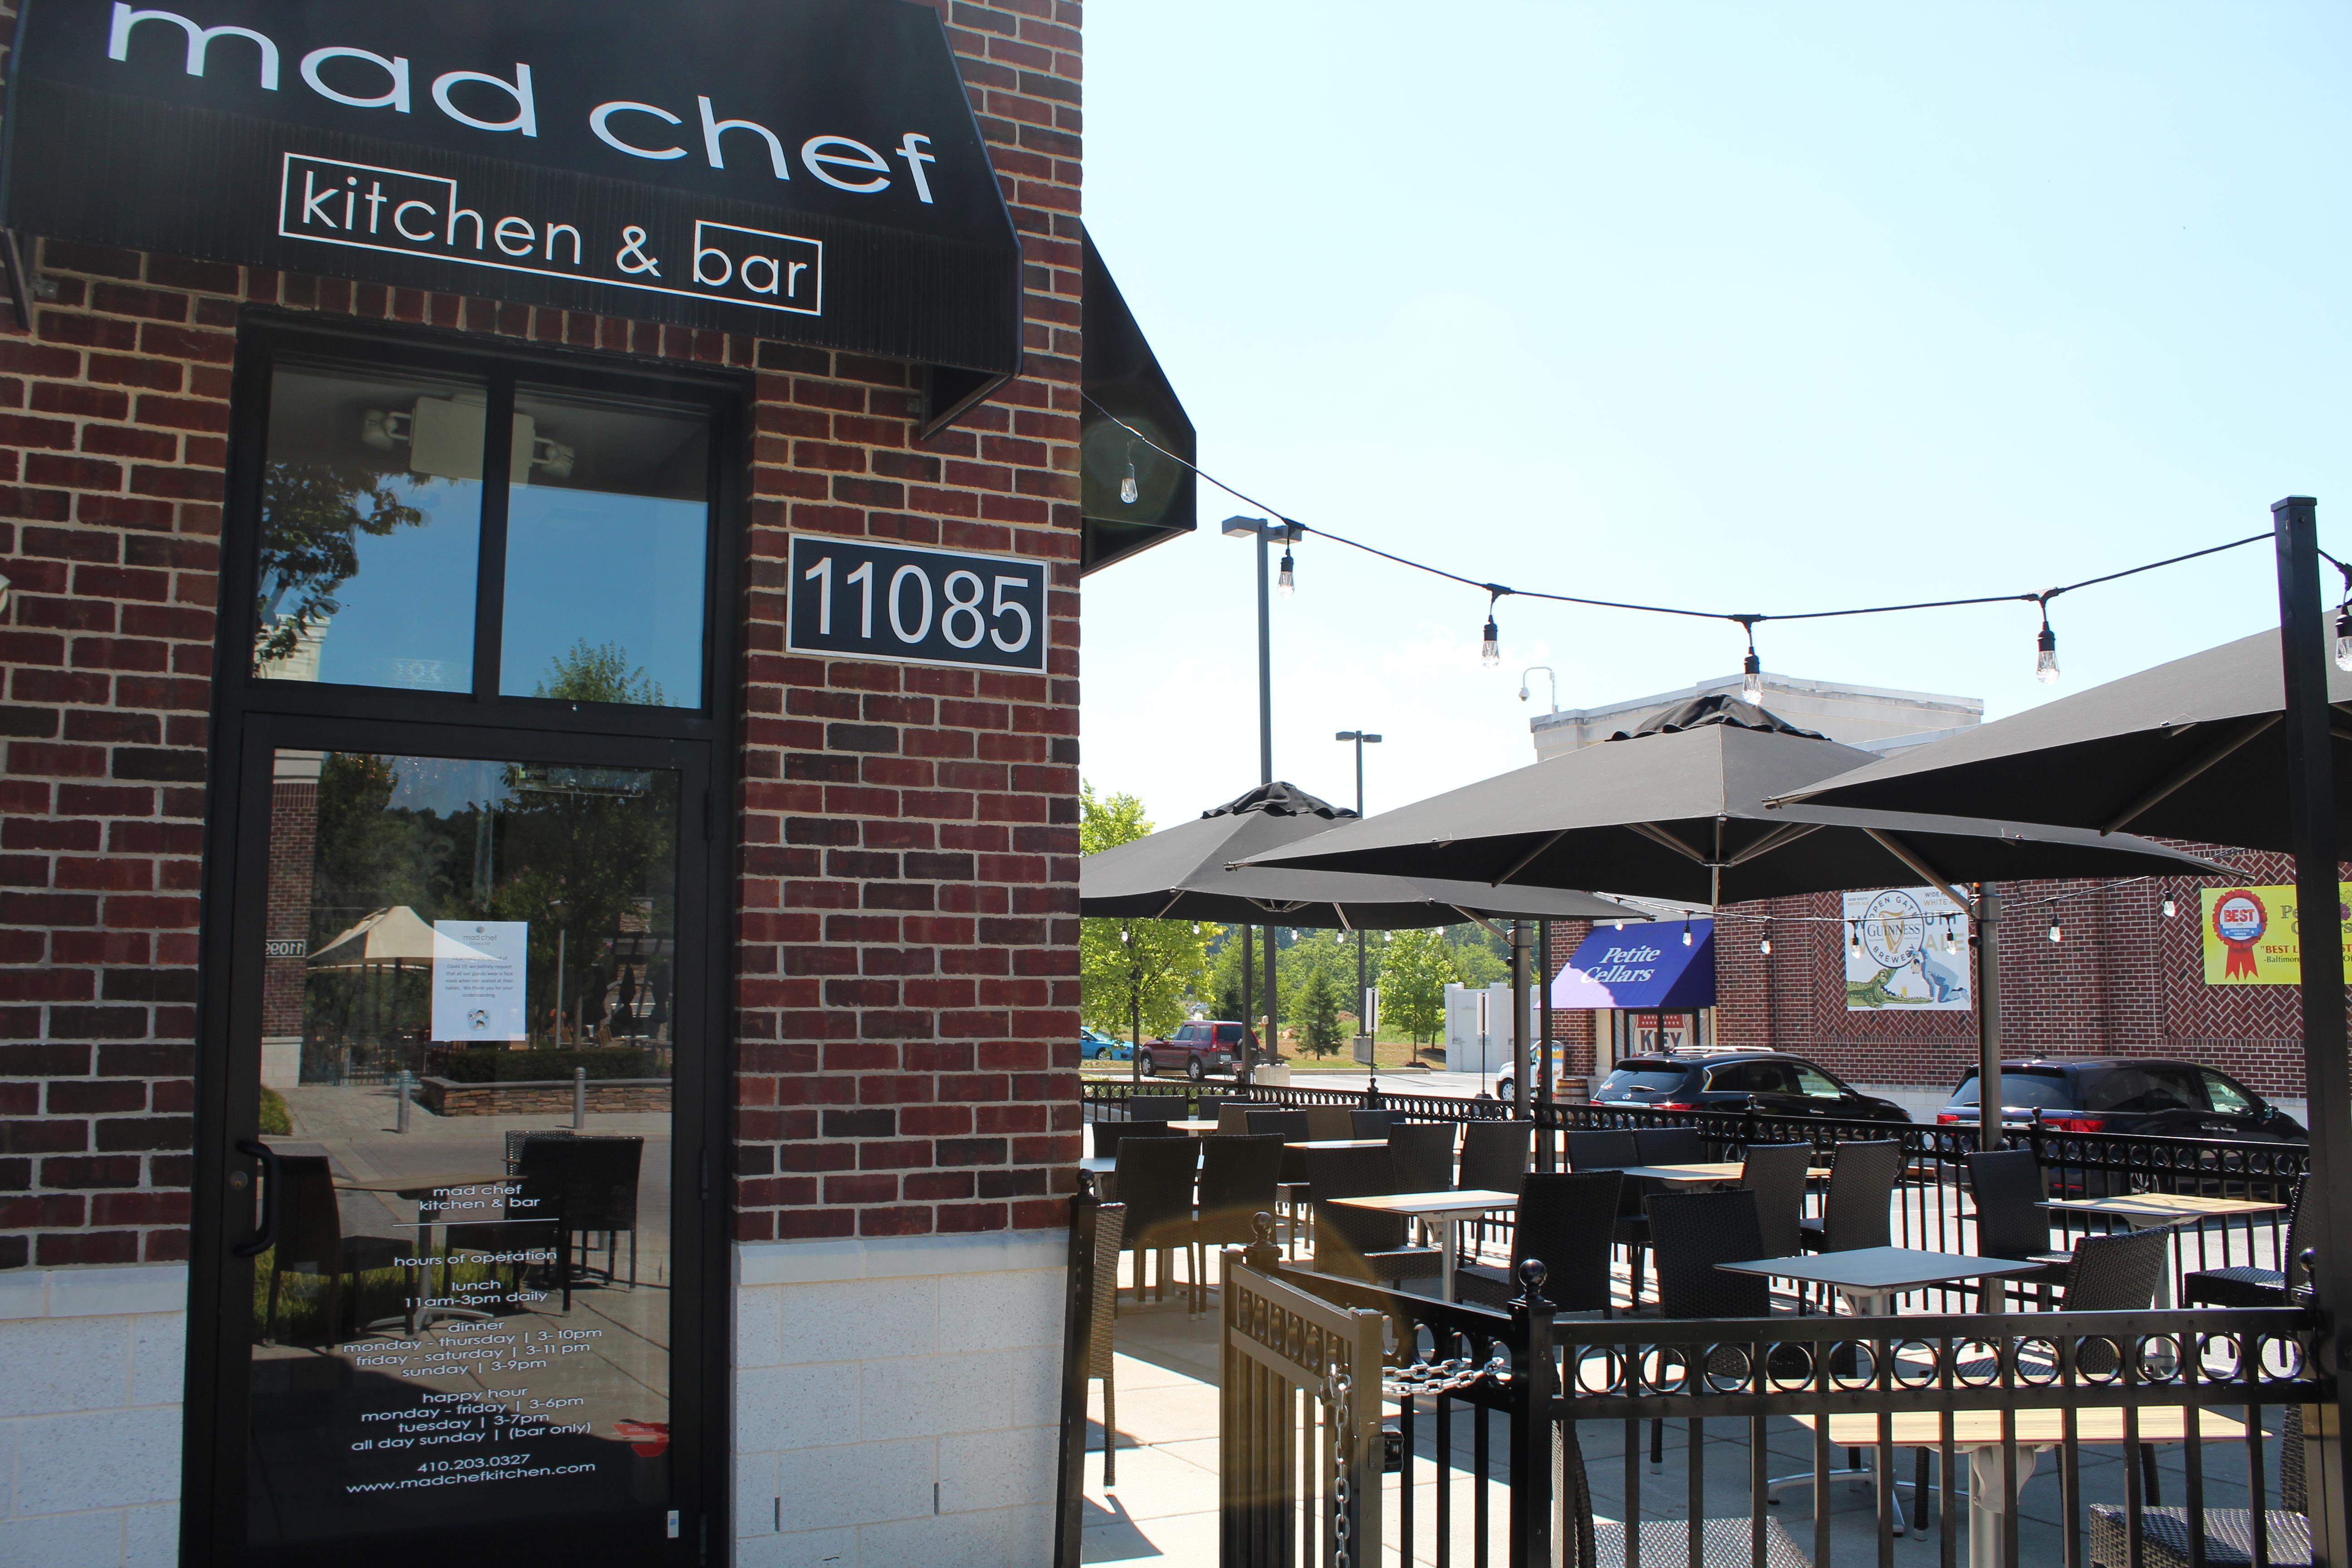 Mad Chef Kitchen Bar Ellicott City Md 21042